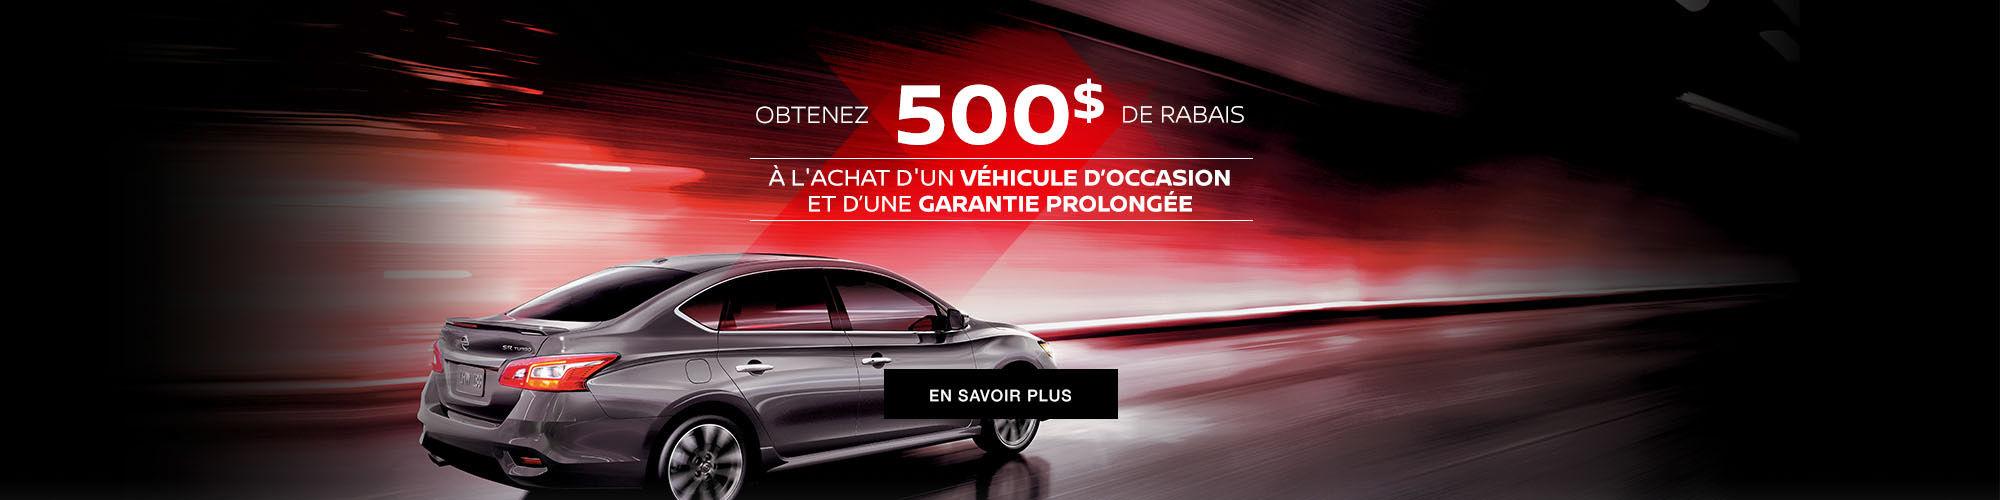 Promo Occasion Nissan